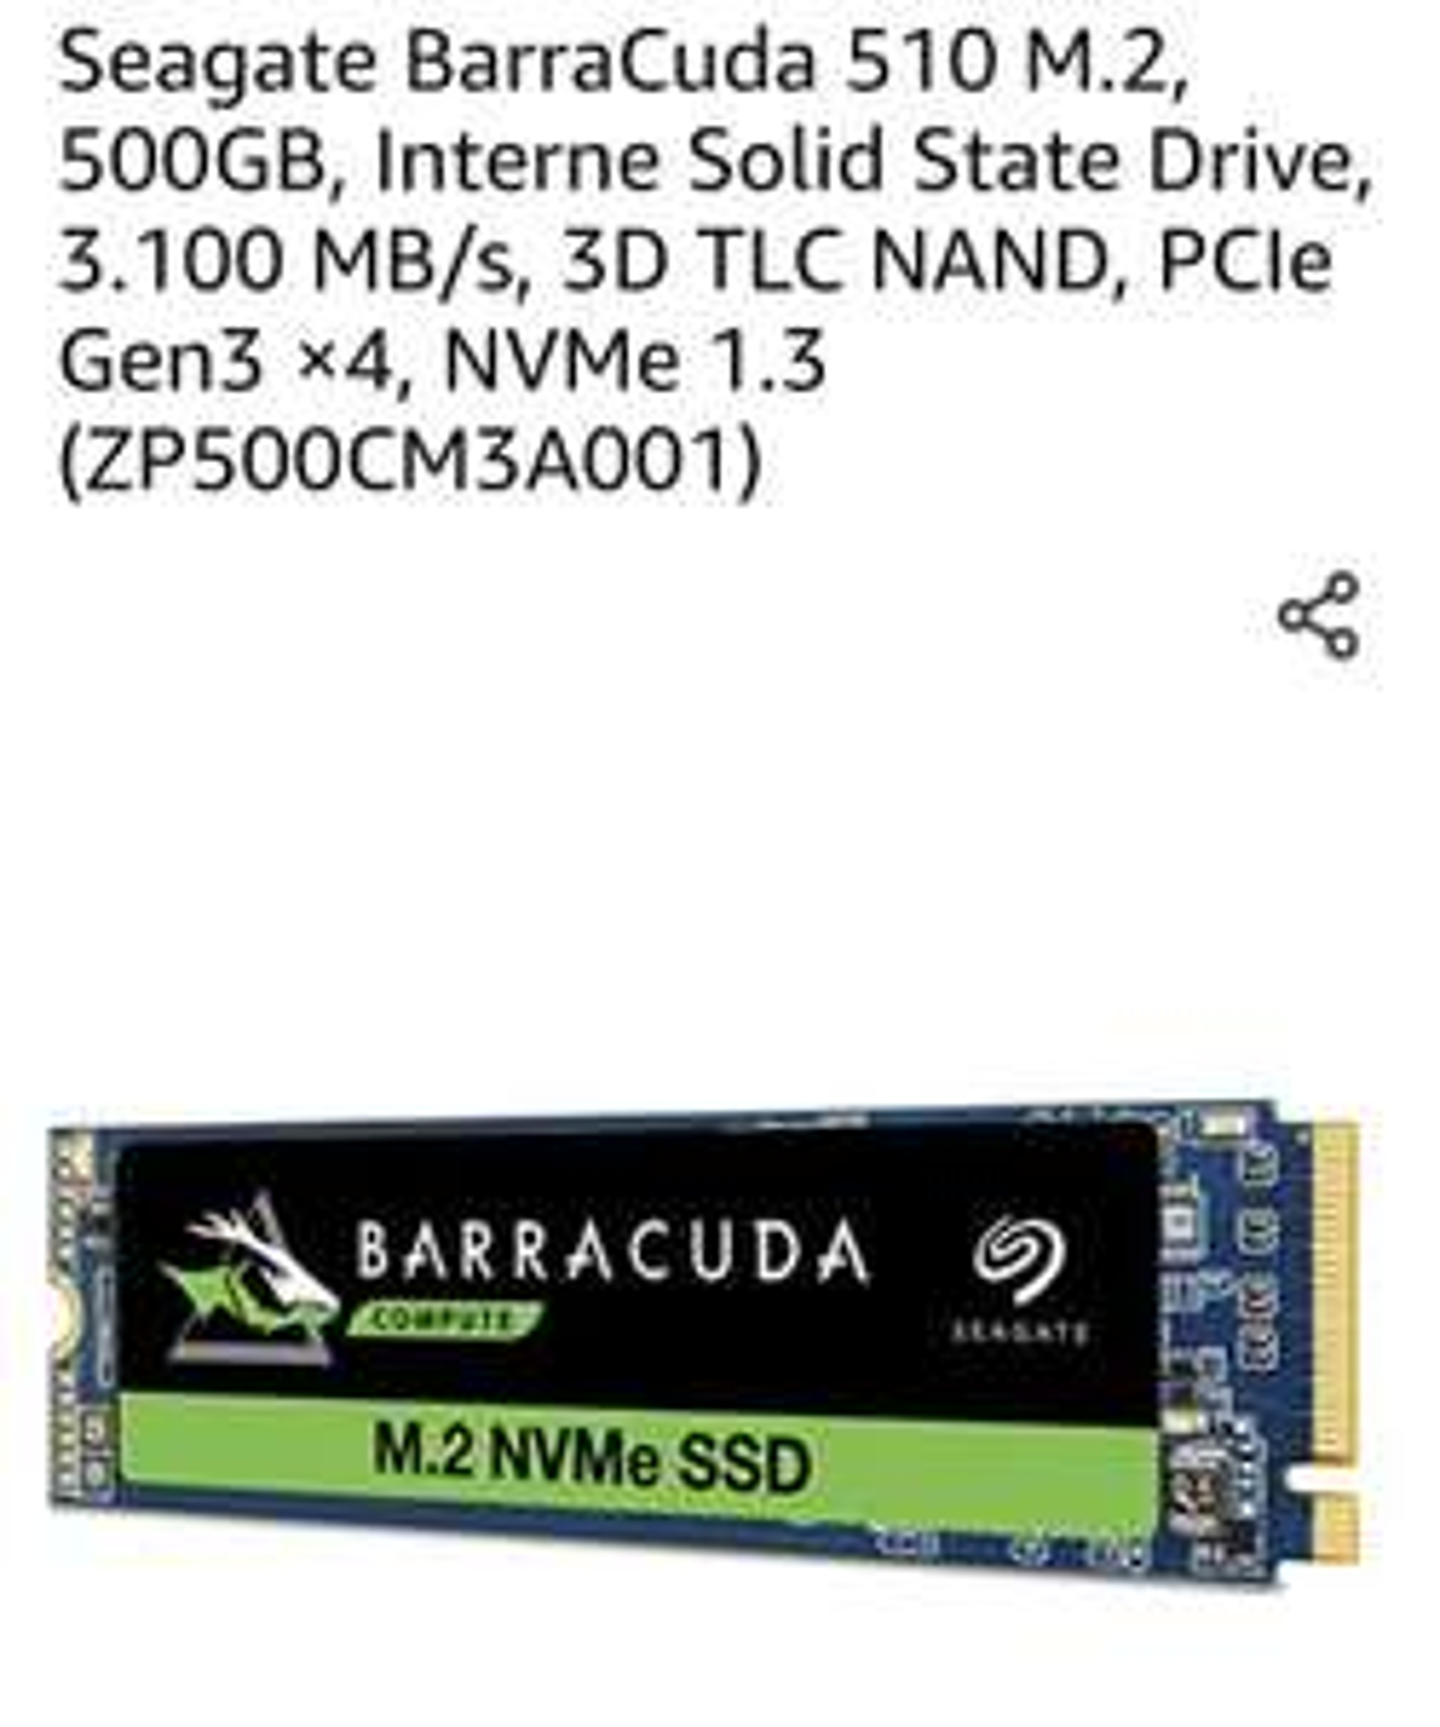 Seagate BarraCuda 510 M.2 NVME SSD, 500GB , 3.100 MB/s, 3D TLC NAND, PCIe Gen3 ×4